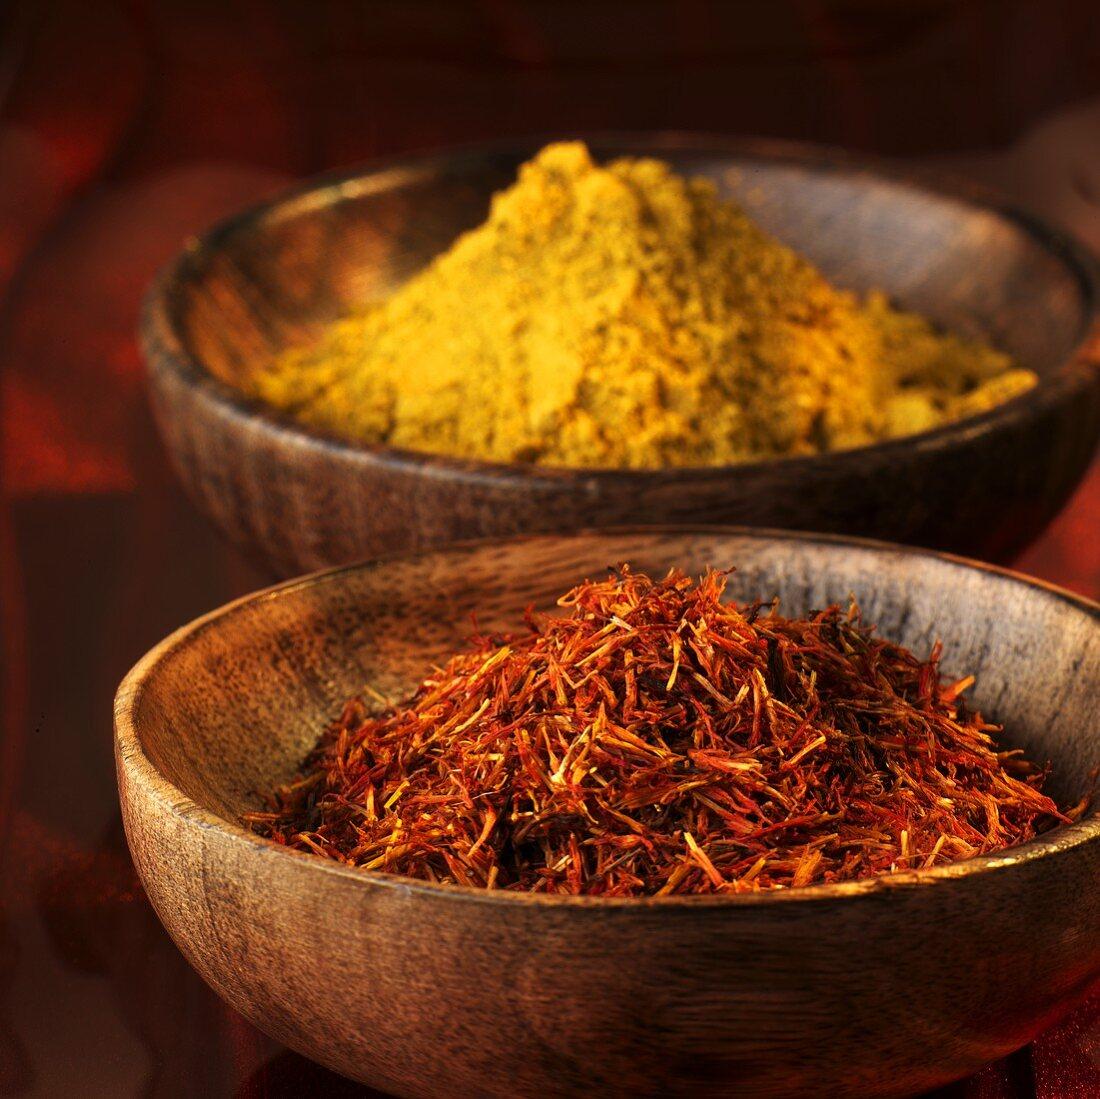 Curry powder and safflower threads (saffron substitute)